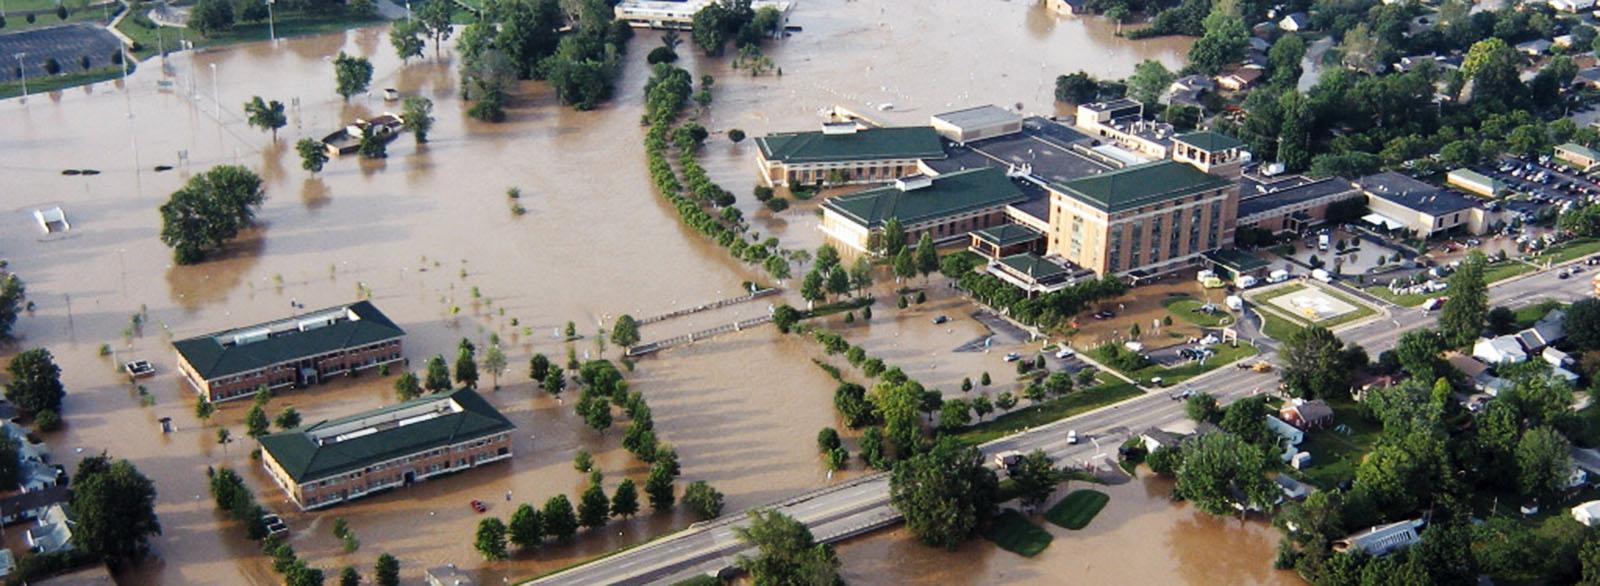 Aerial photo showing 2008 flood damage to hospital